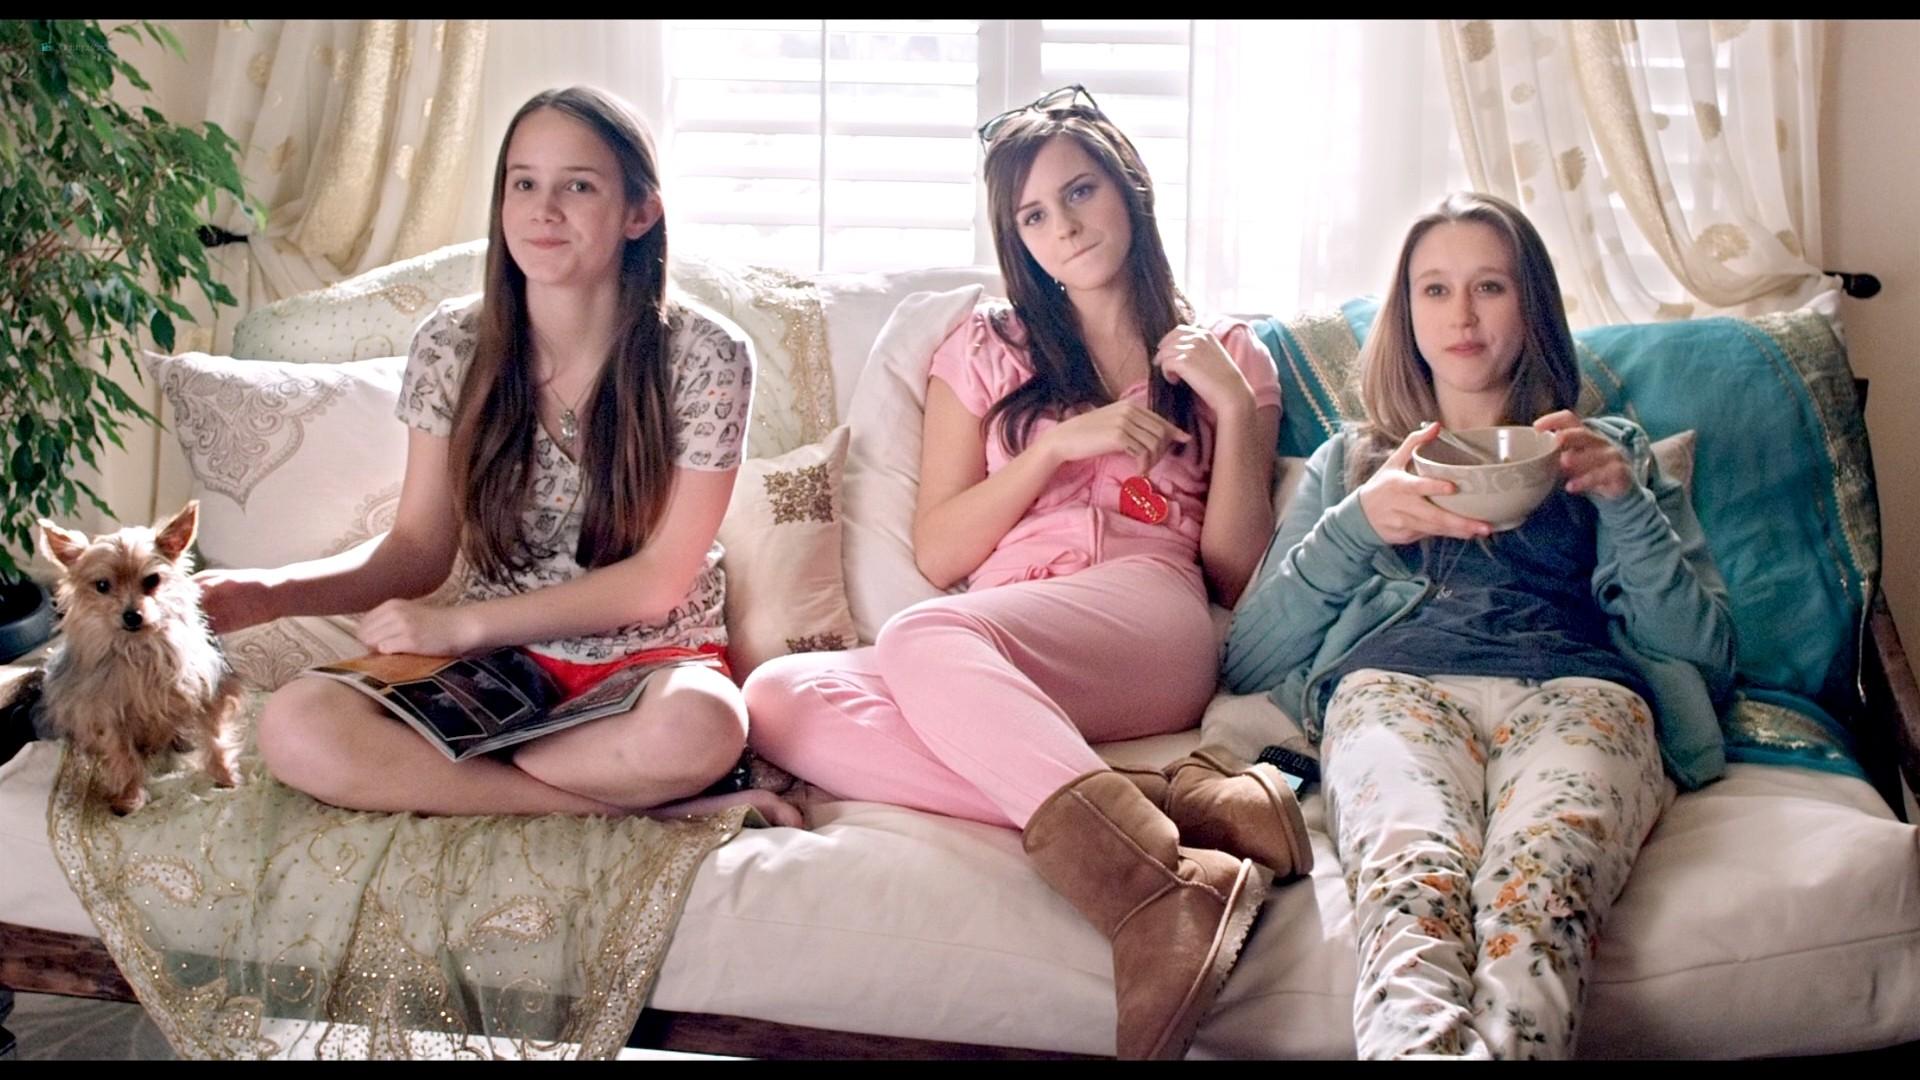 Emma Watson hot Taissa Farmiga and others sexy - The Bling Ring (2013) HD 1080p BluRay (16)